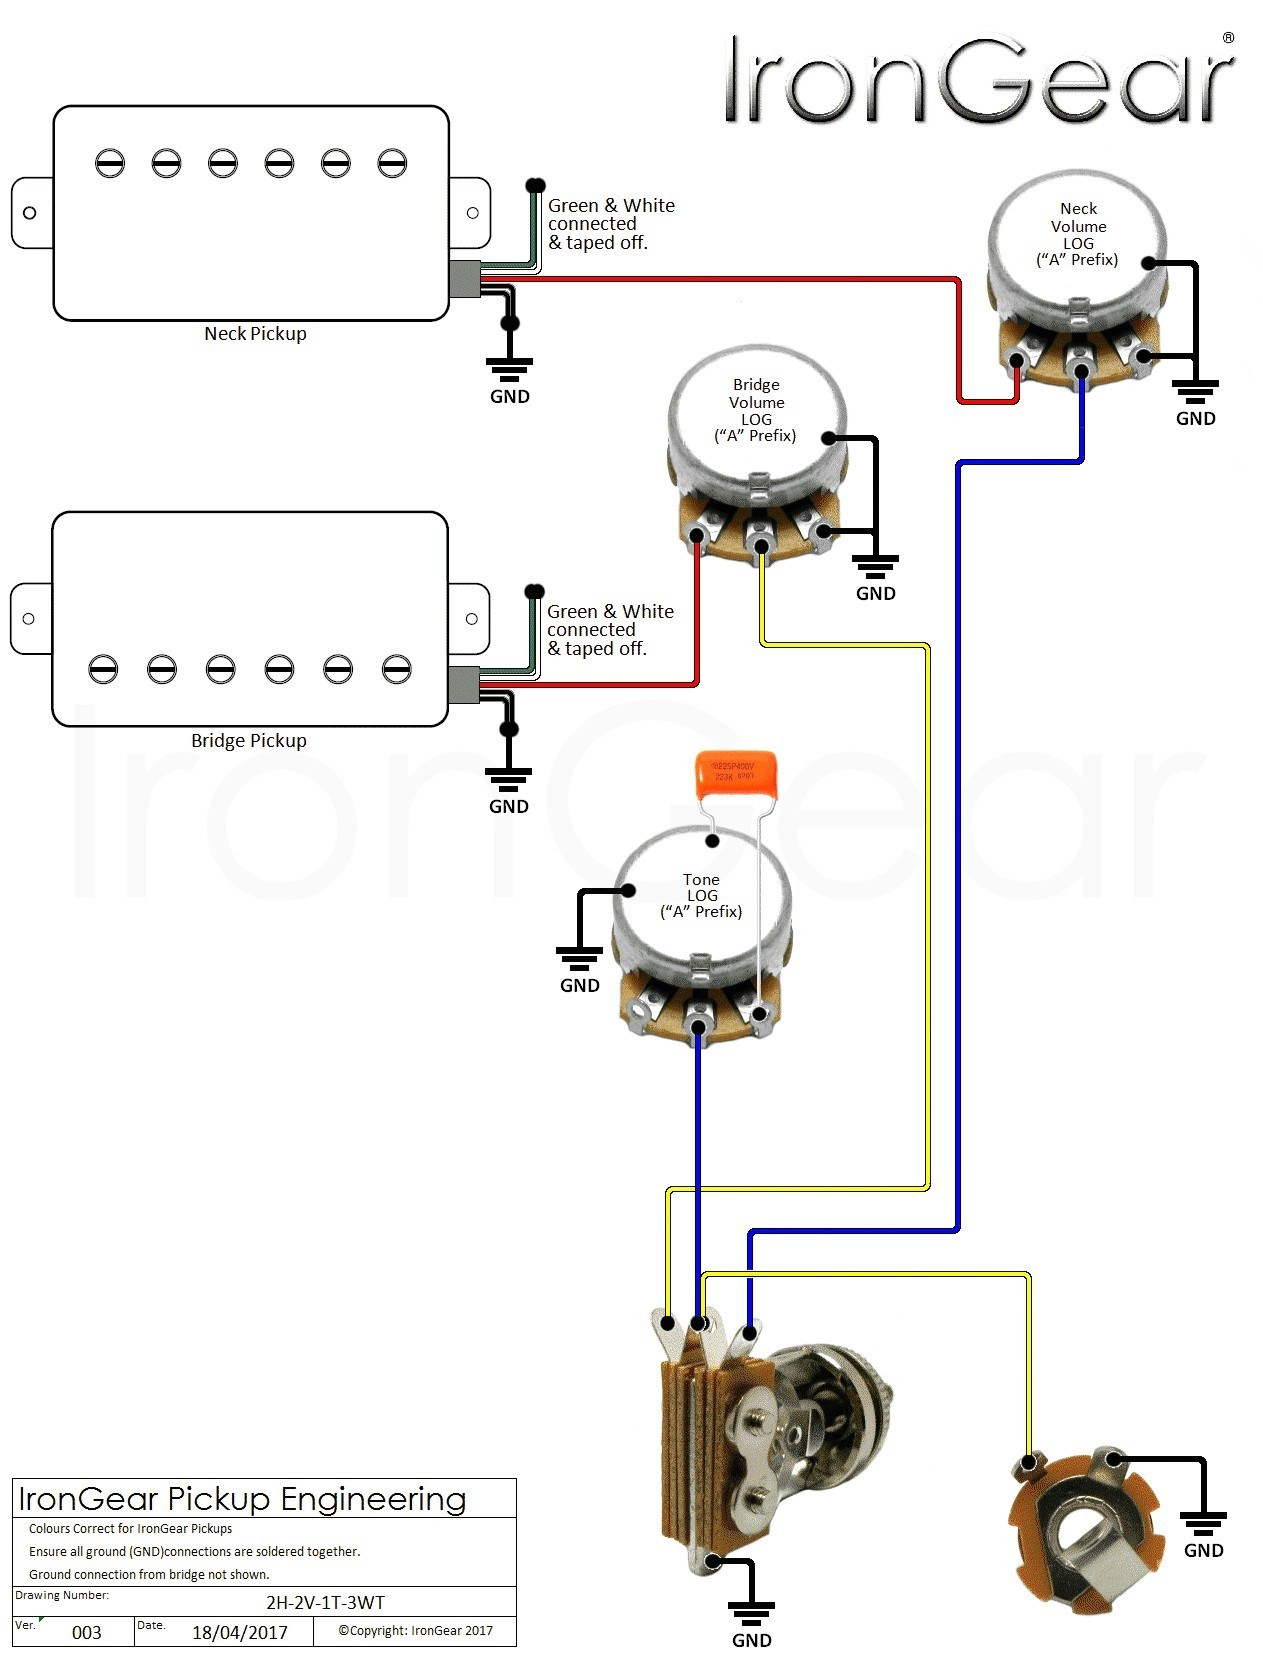 guitar wiring diagrams 2 pickups humbucker wiring diagrams to her rh detoxicrecenze com Two Single Coil Guitar Wiring Diagram Guitar Wiring Diagrams 2 Pickups